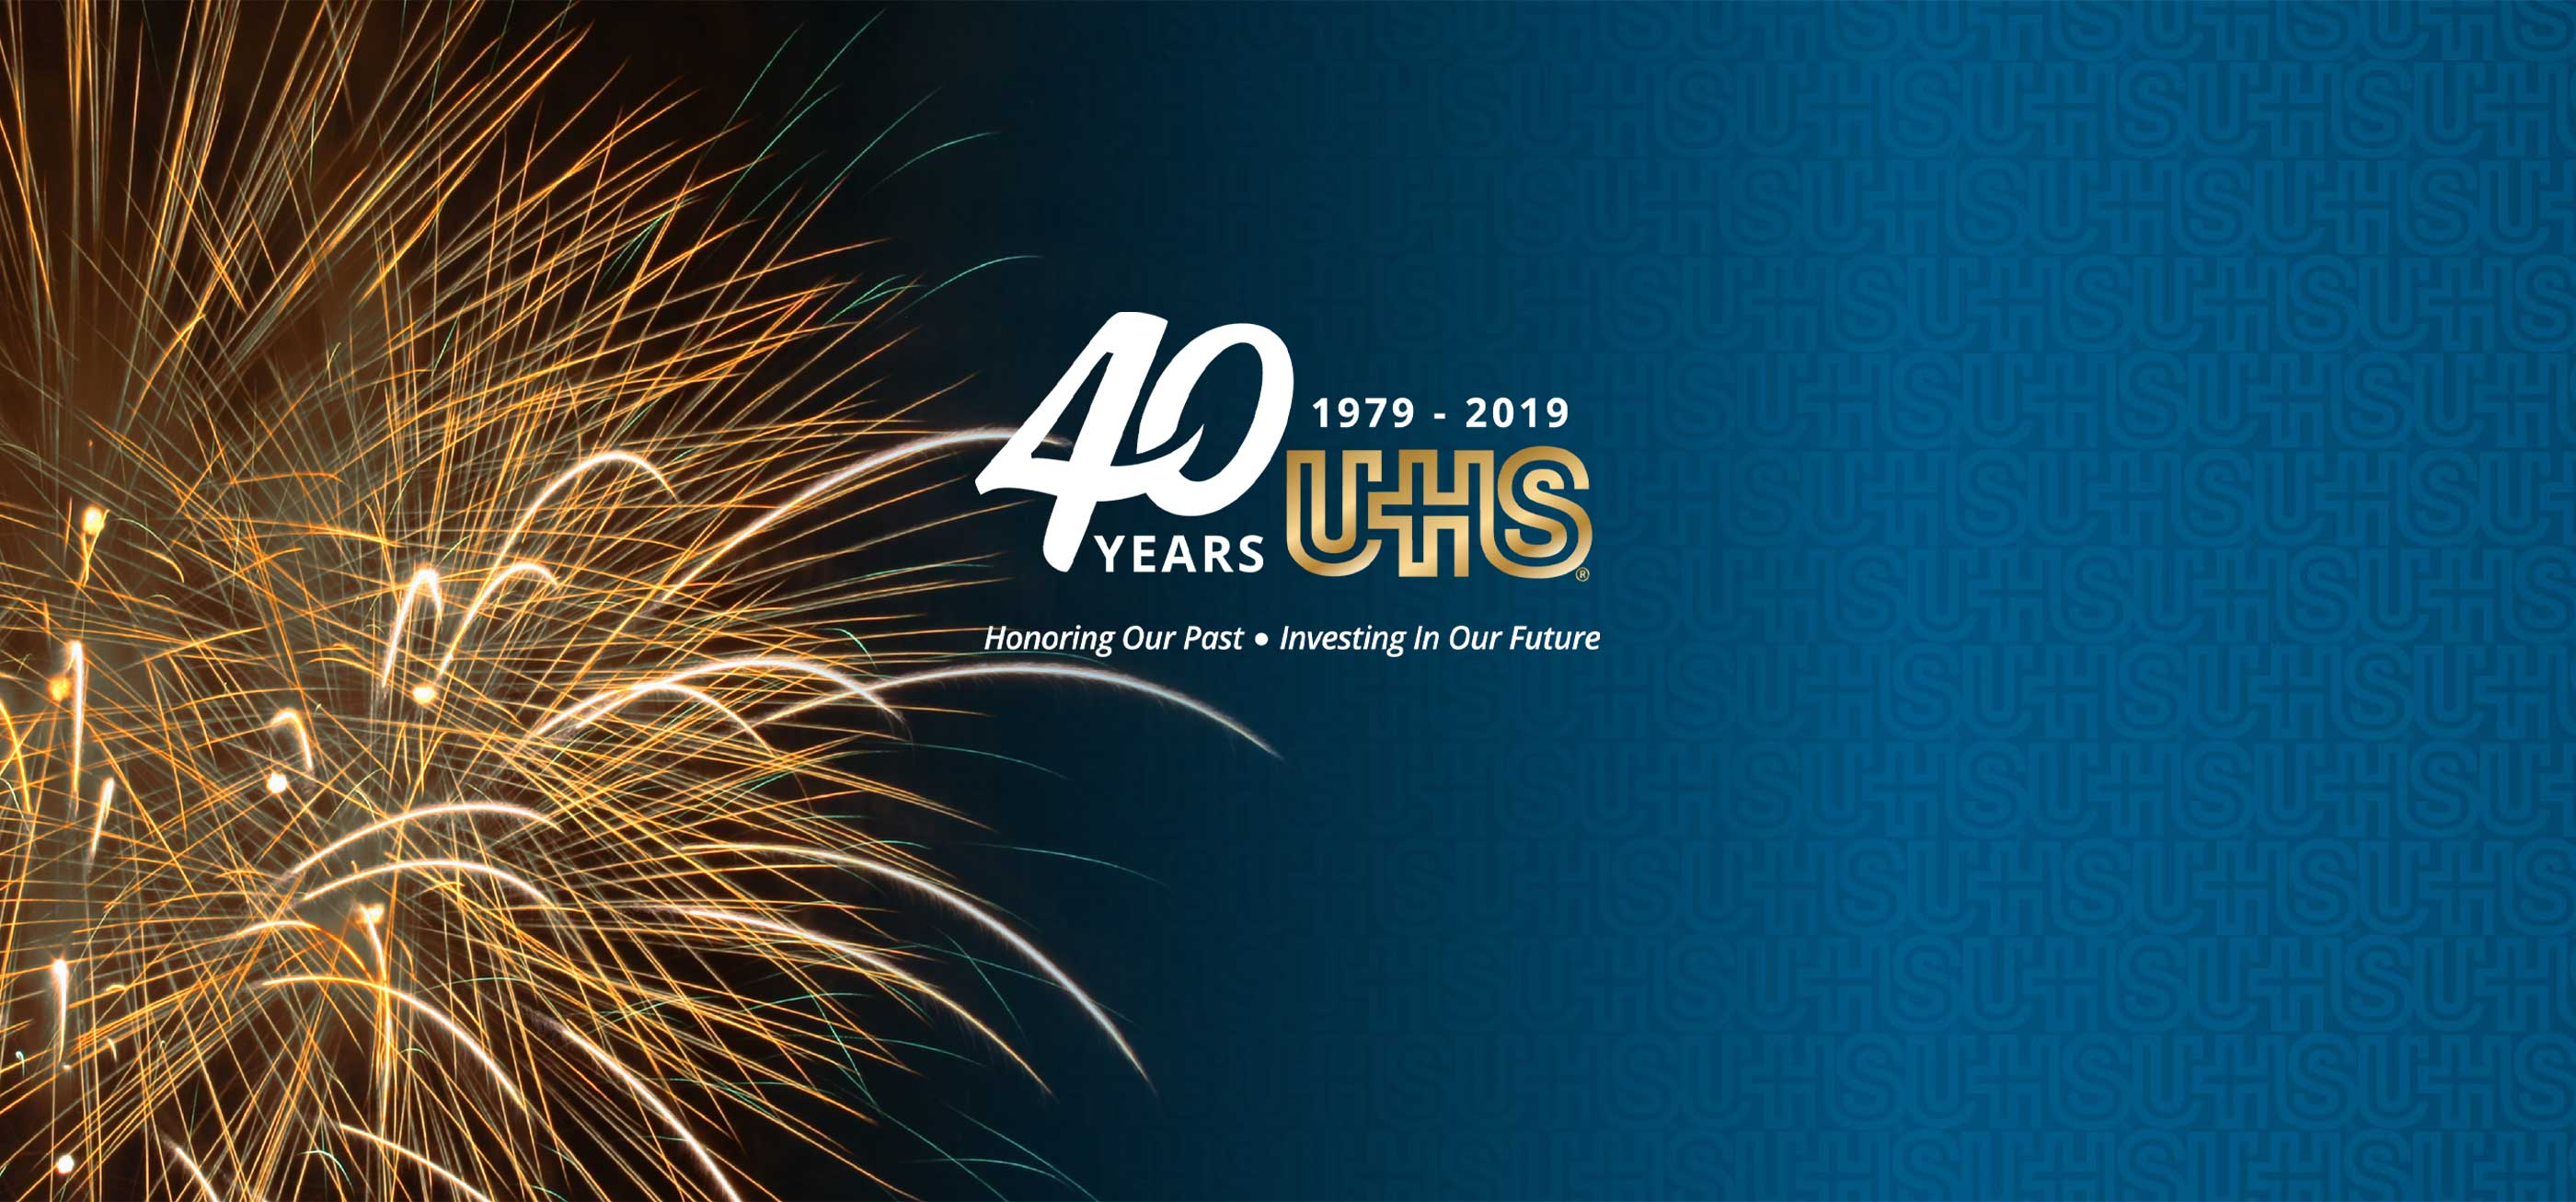 UHS 40 years